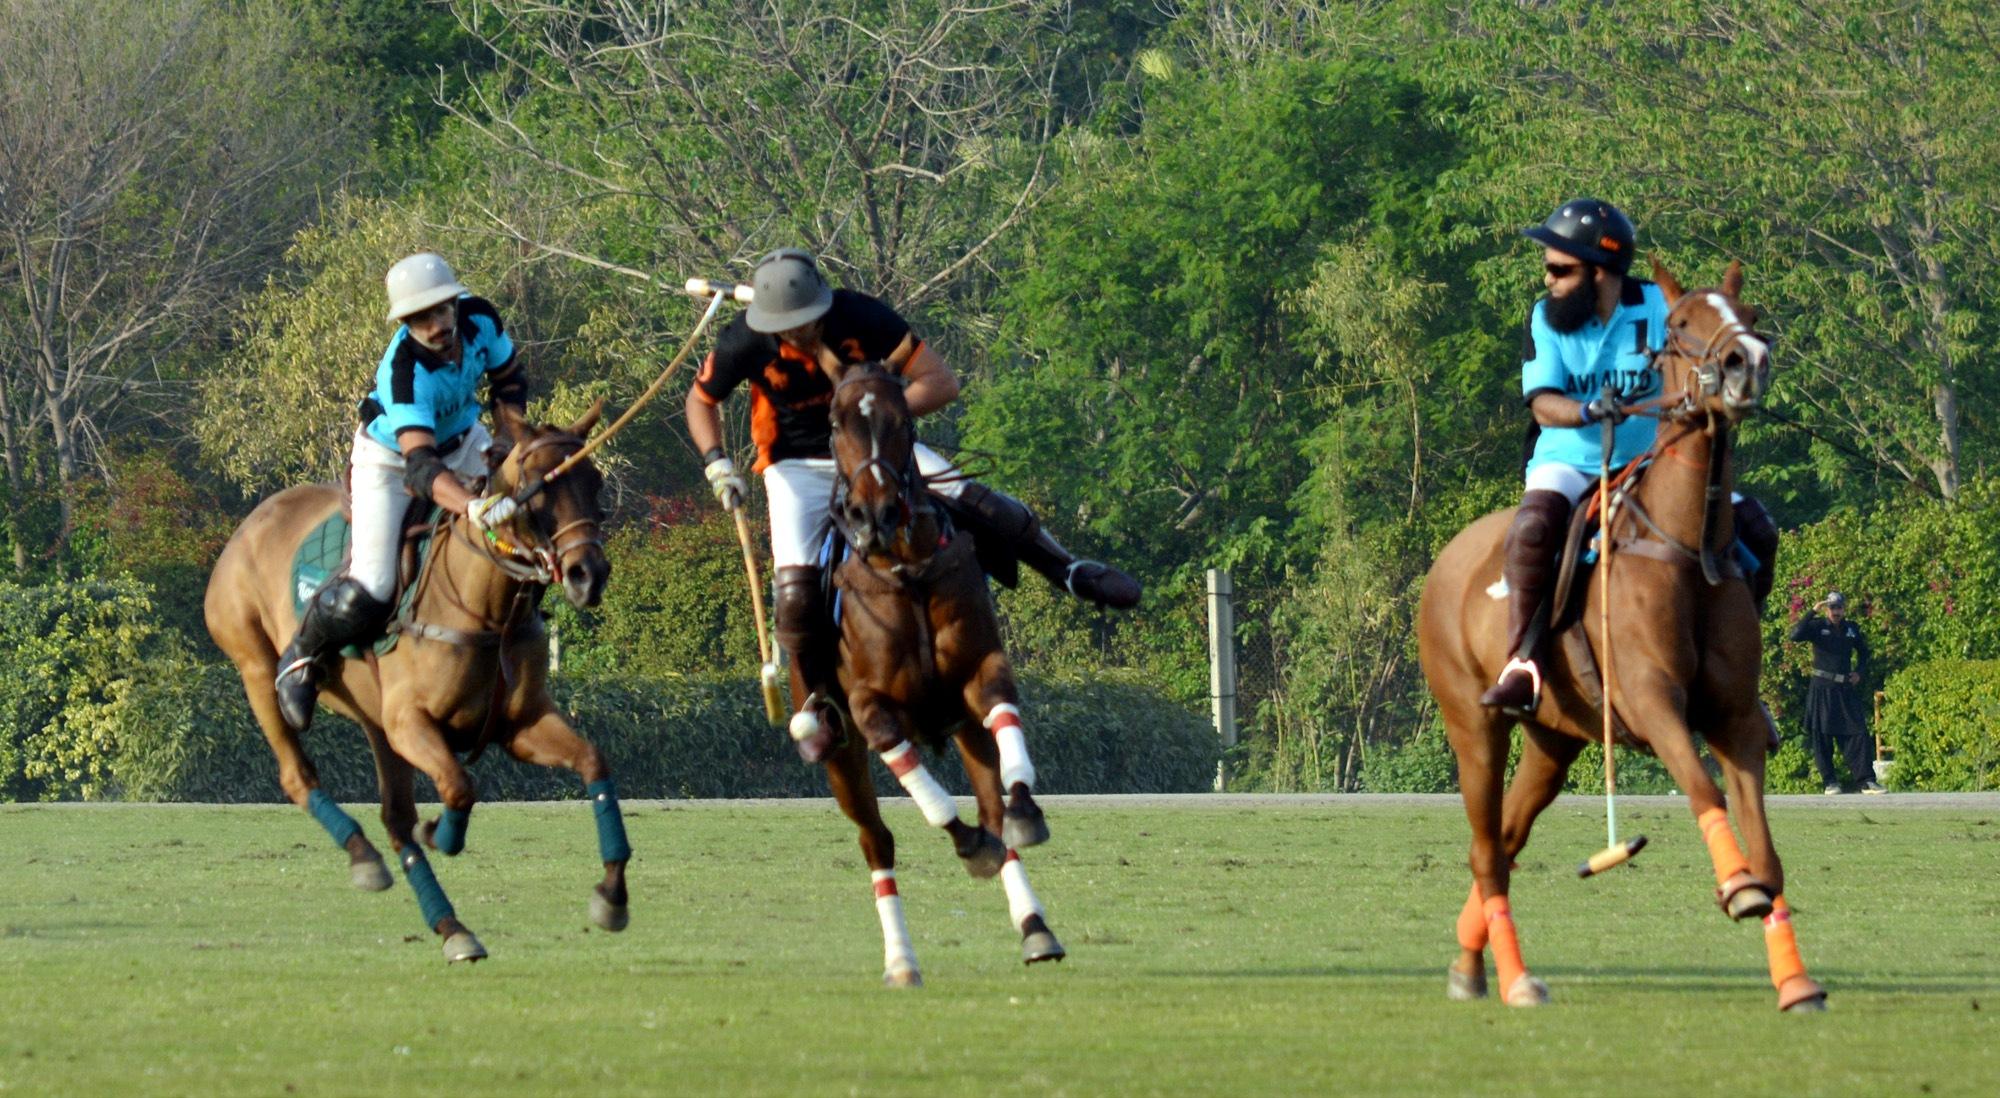 Ravi Autos vs Mater Paints in the Bank Alfalah National Polo Championhip at LPC